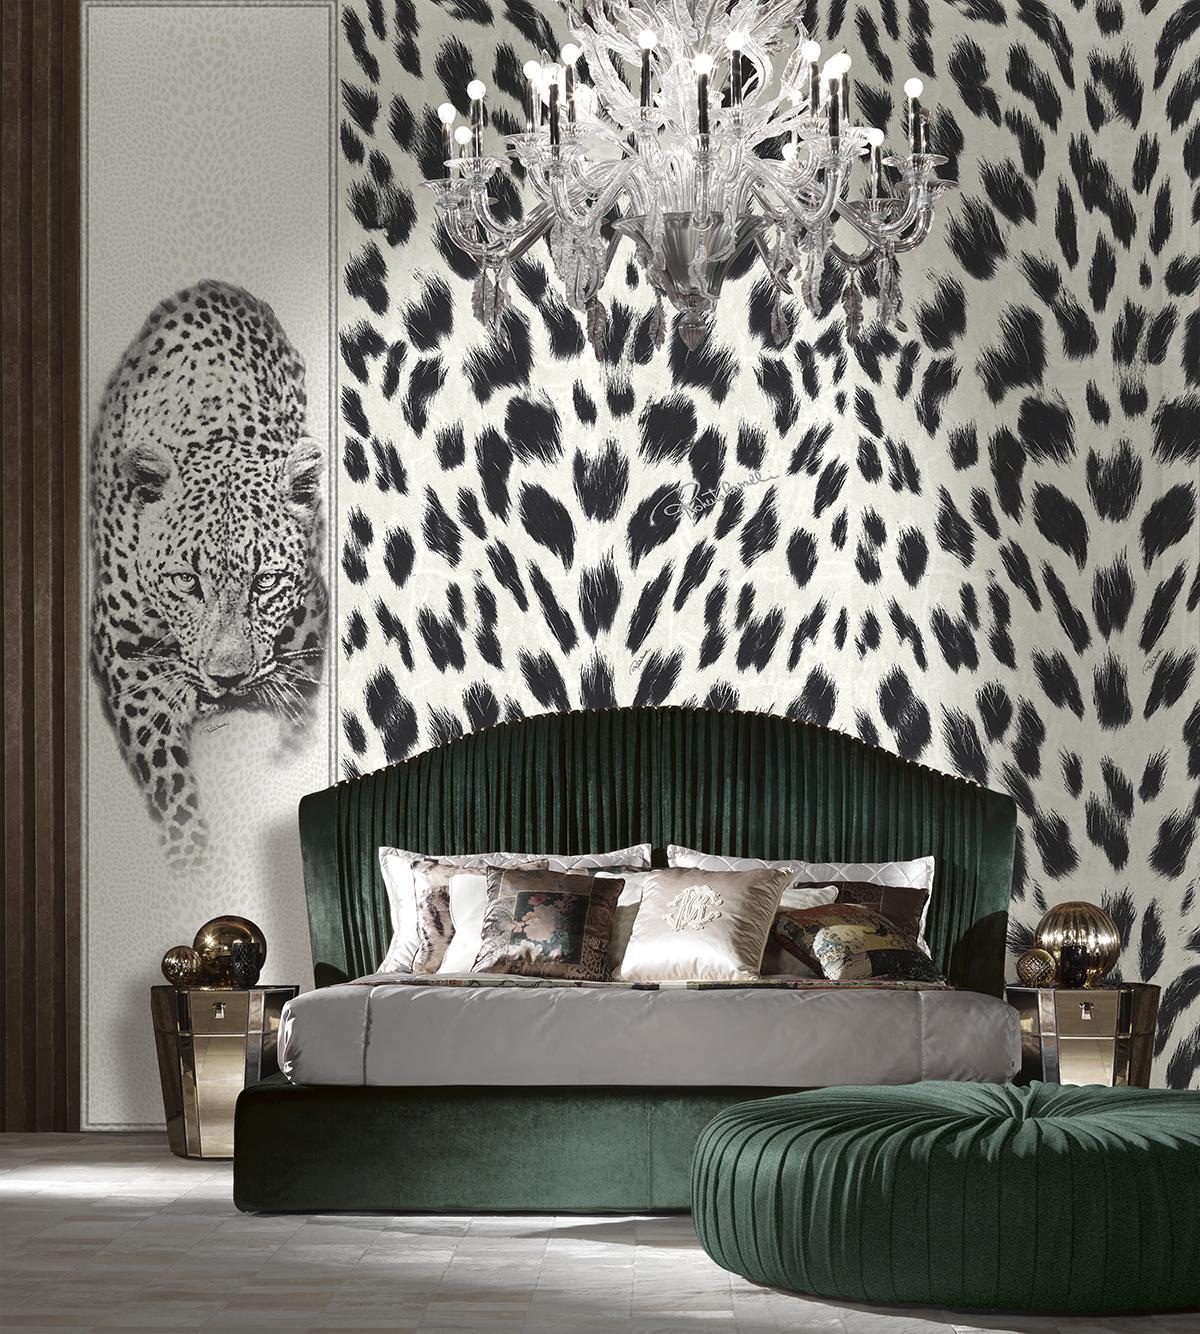 Home Roberto Cavalli Roberto Cavalli Wallpapers   Roberto 1200x1334